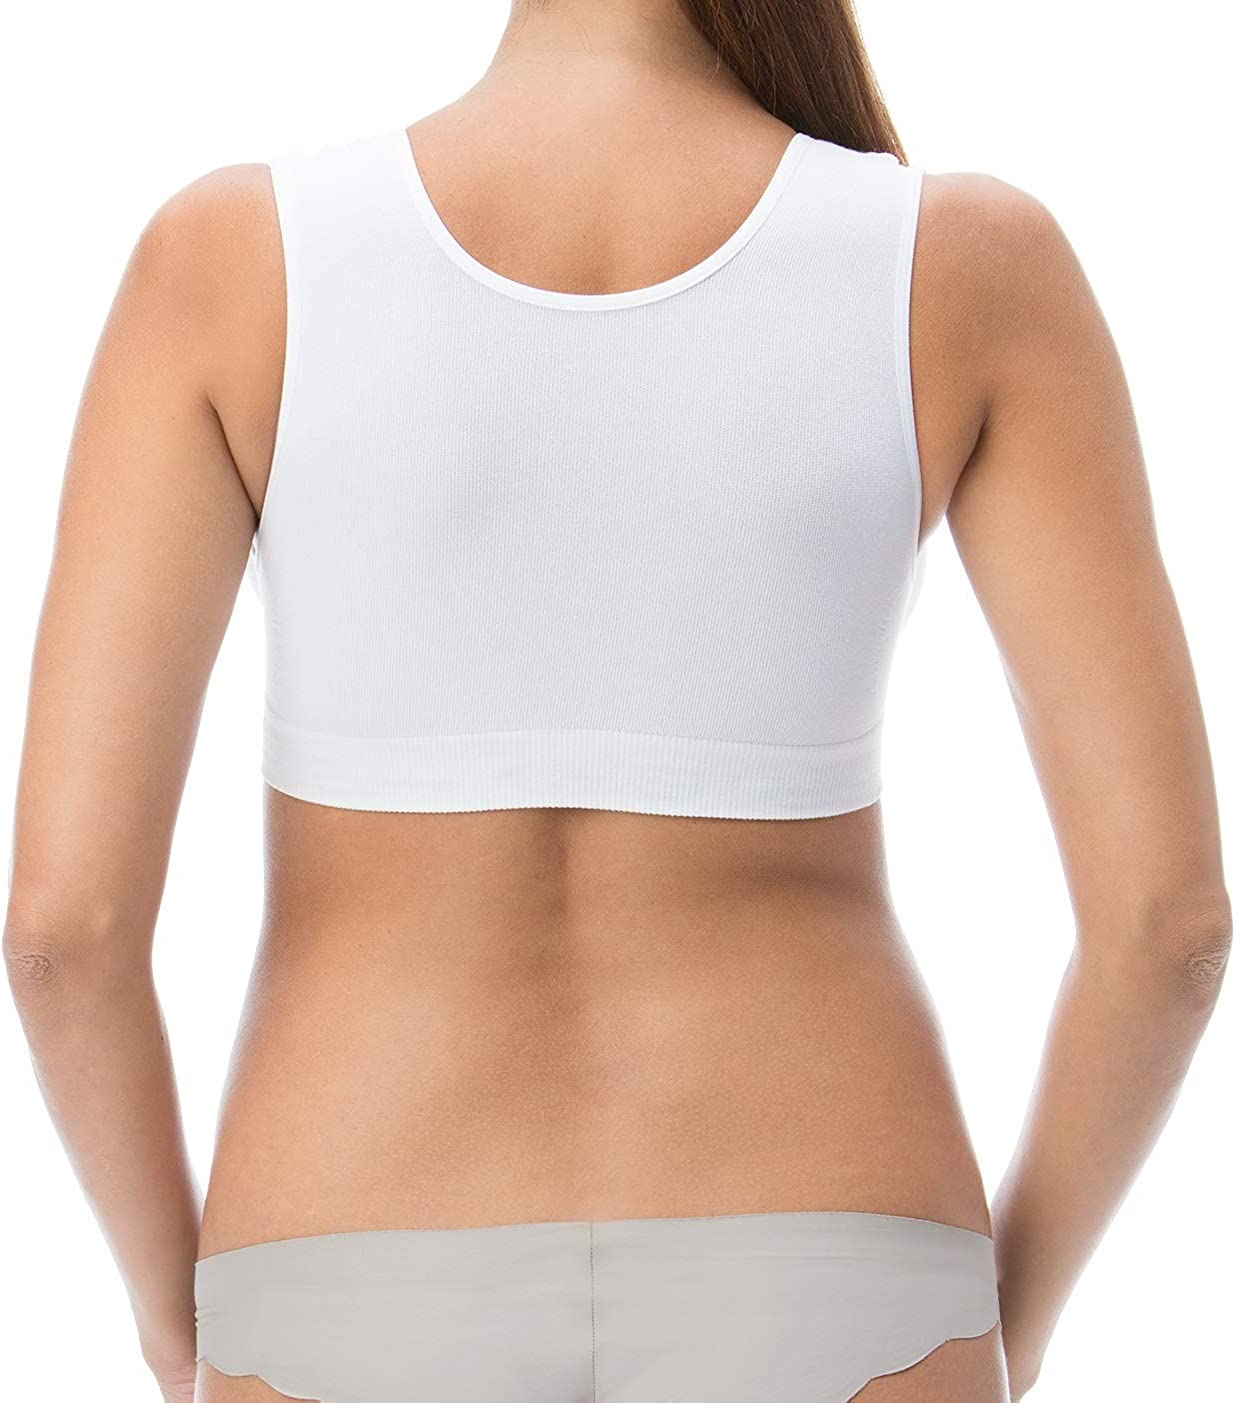 RelaxMaternity 5710 Smart cotton support nursing bra